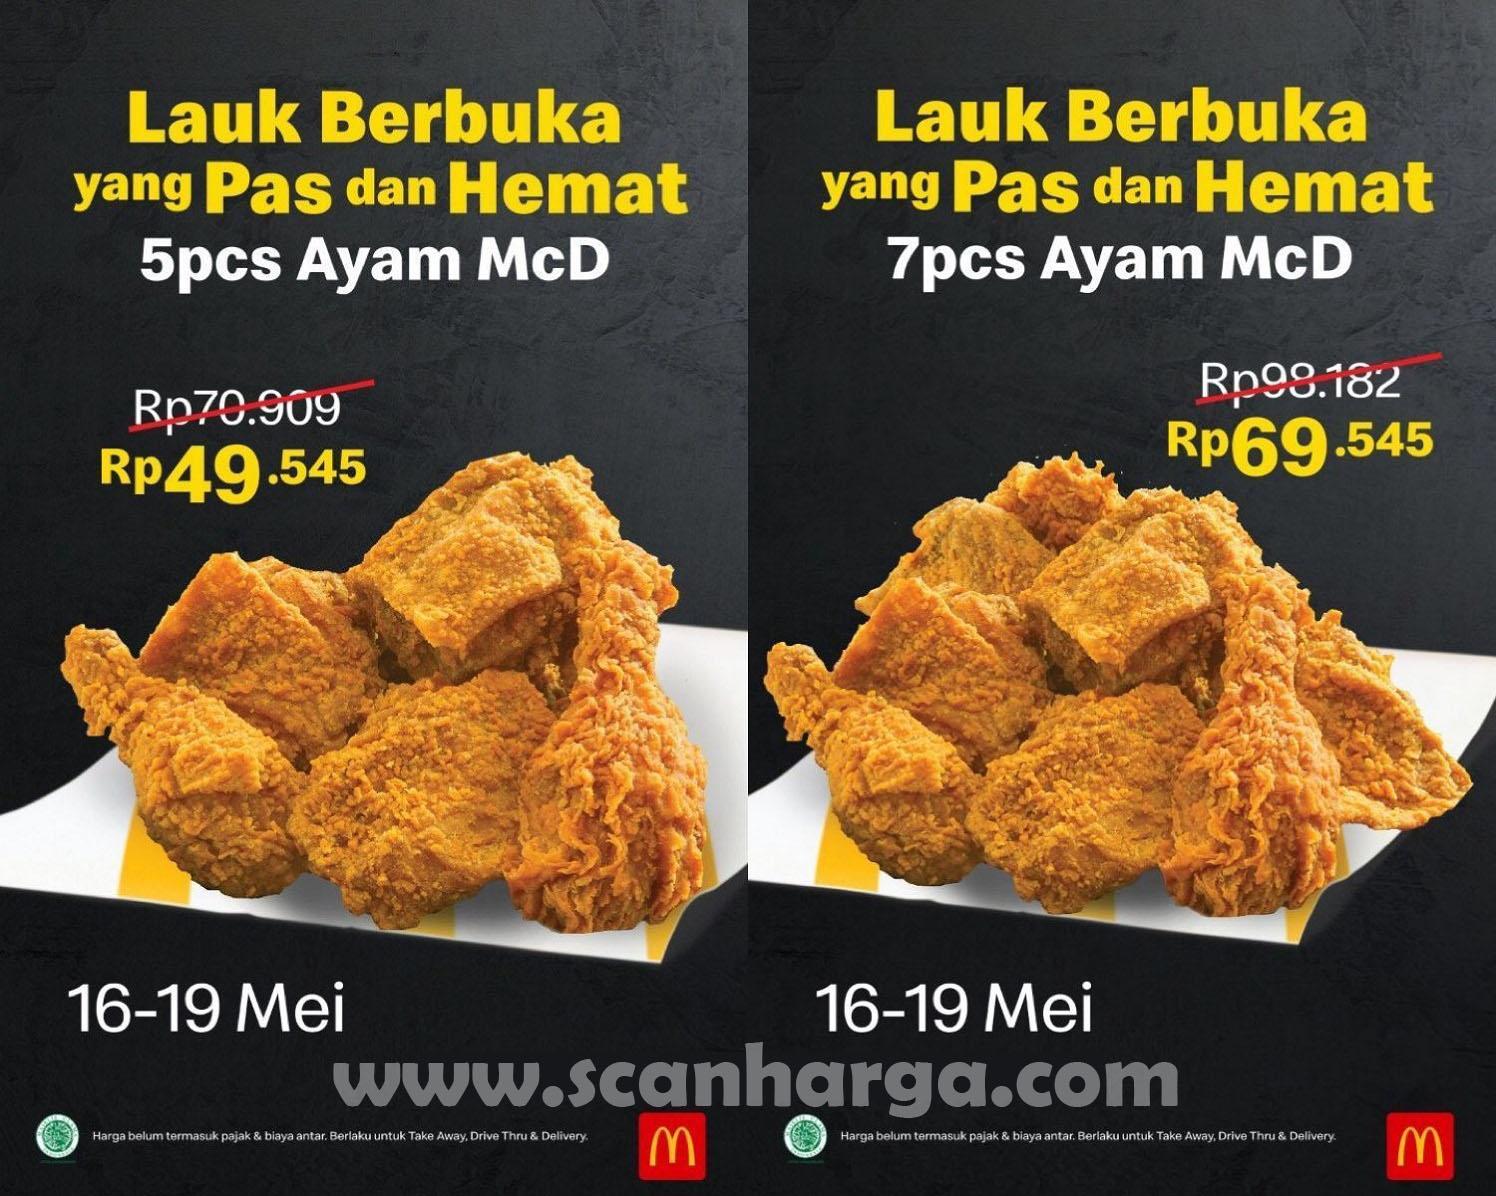 Promo McDonalds Paket 5 pcs Ayam McD Rp 49.545 Berlaku 16 - 19 Mei 2020